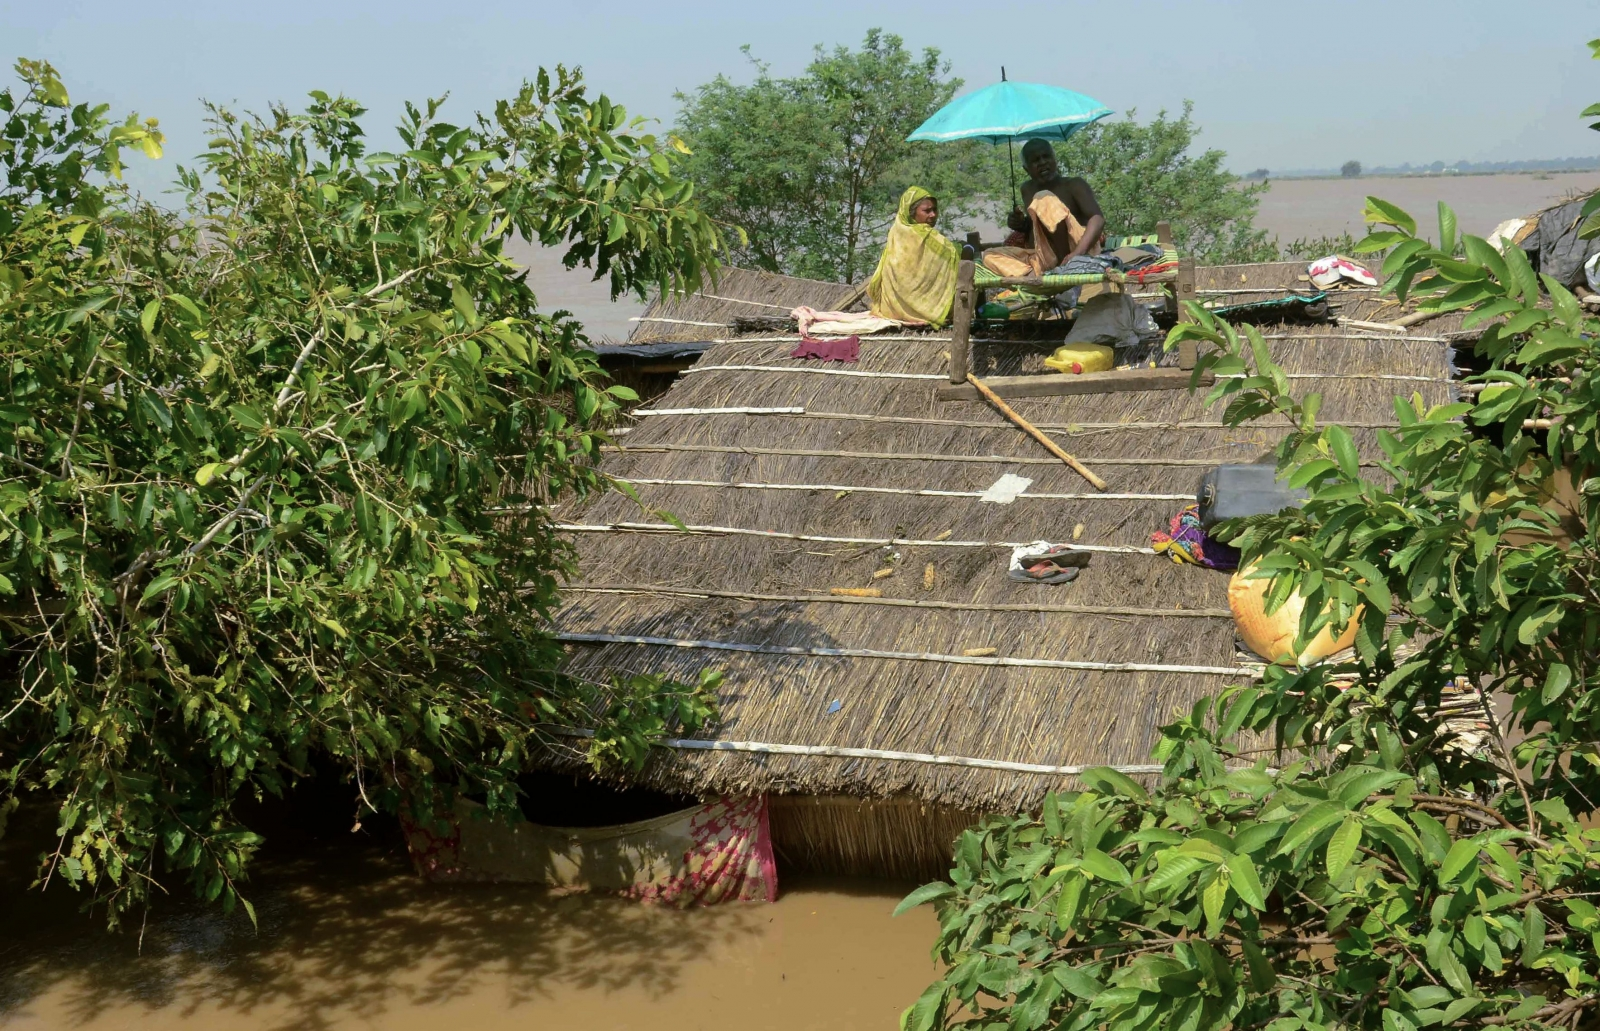 Danapur Diara in Patna in eastern Bihar state